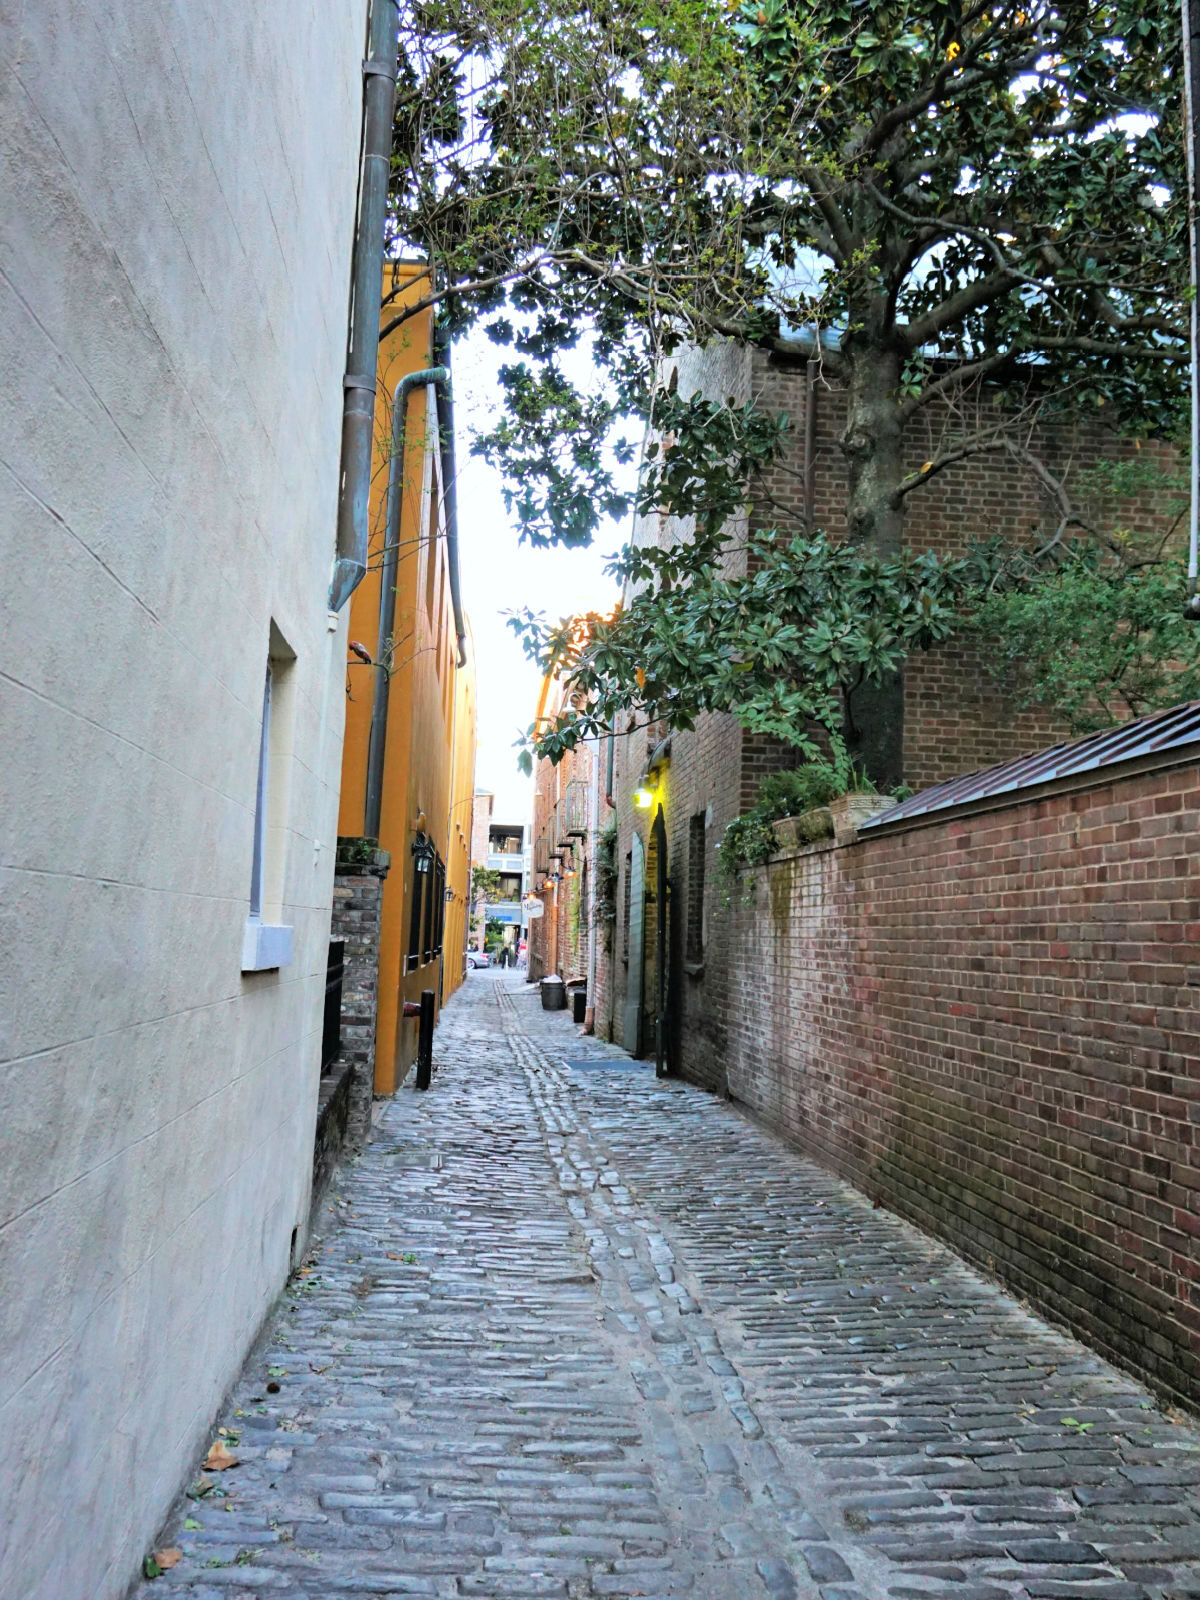 Narrow alley in Charleston.